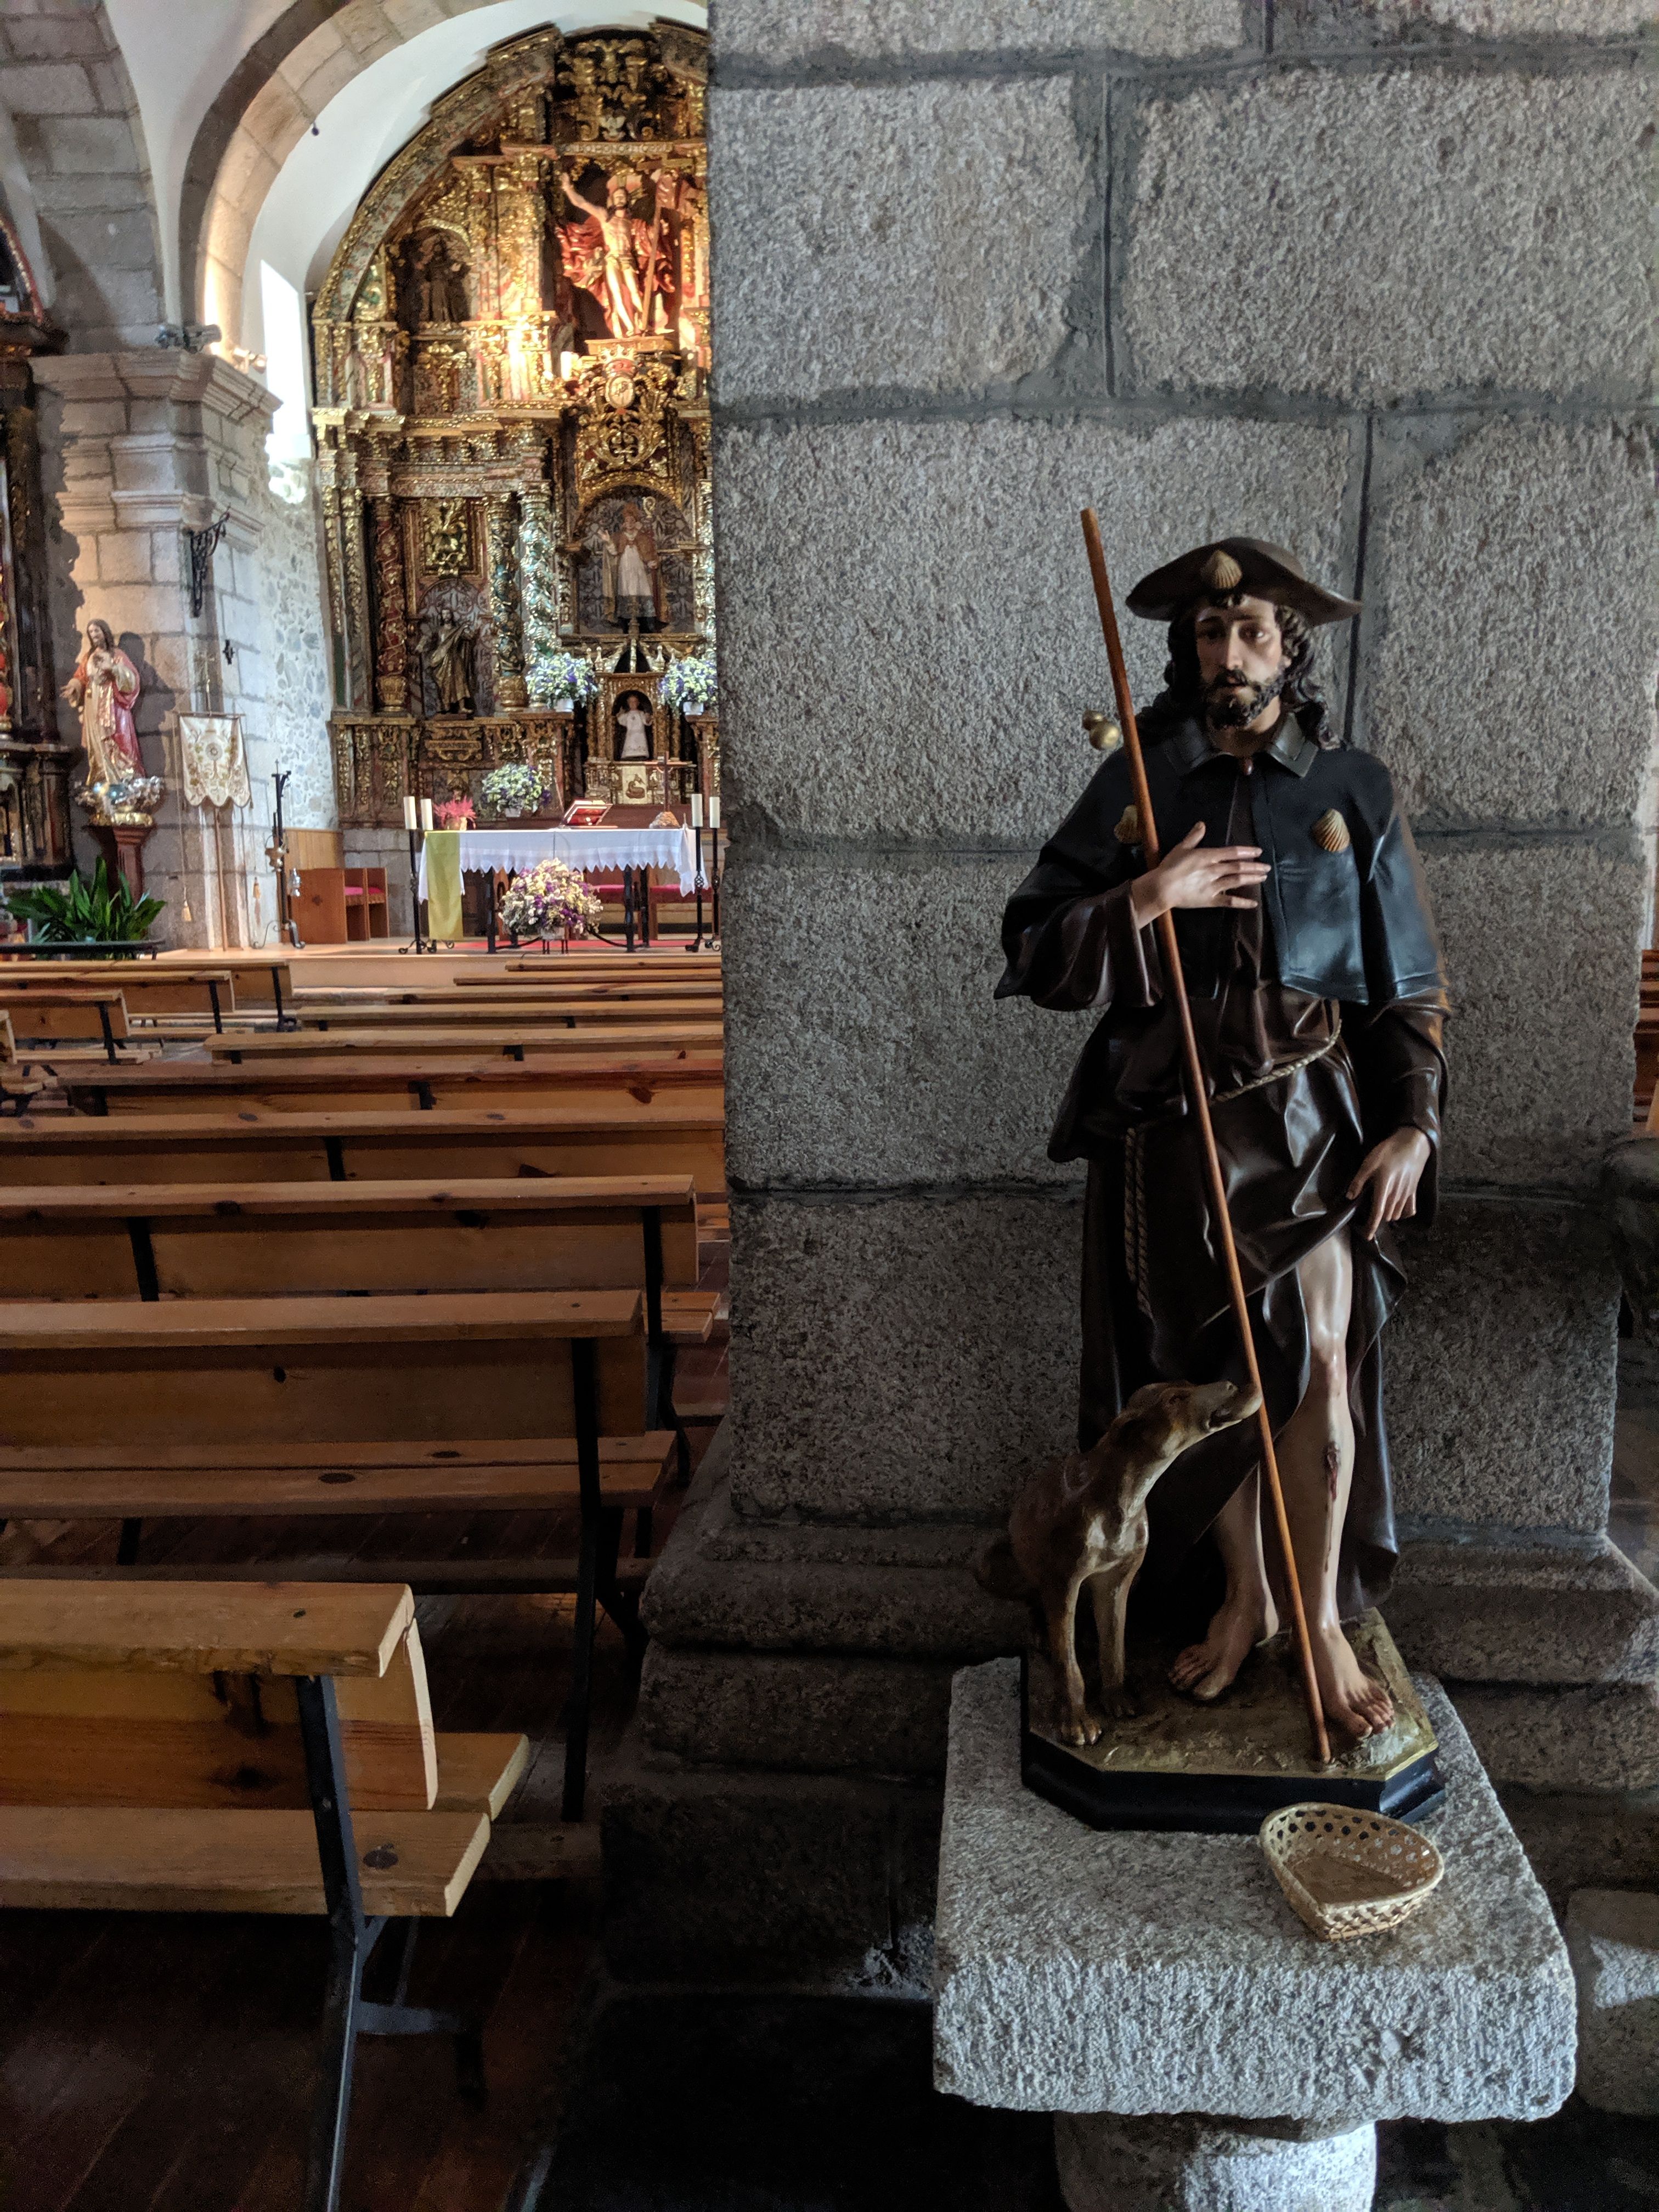 St. James, Santiago, apostle of Jesus, St. james the pilgrim